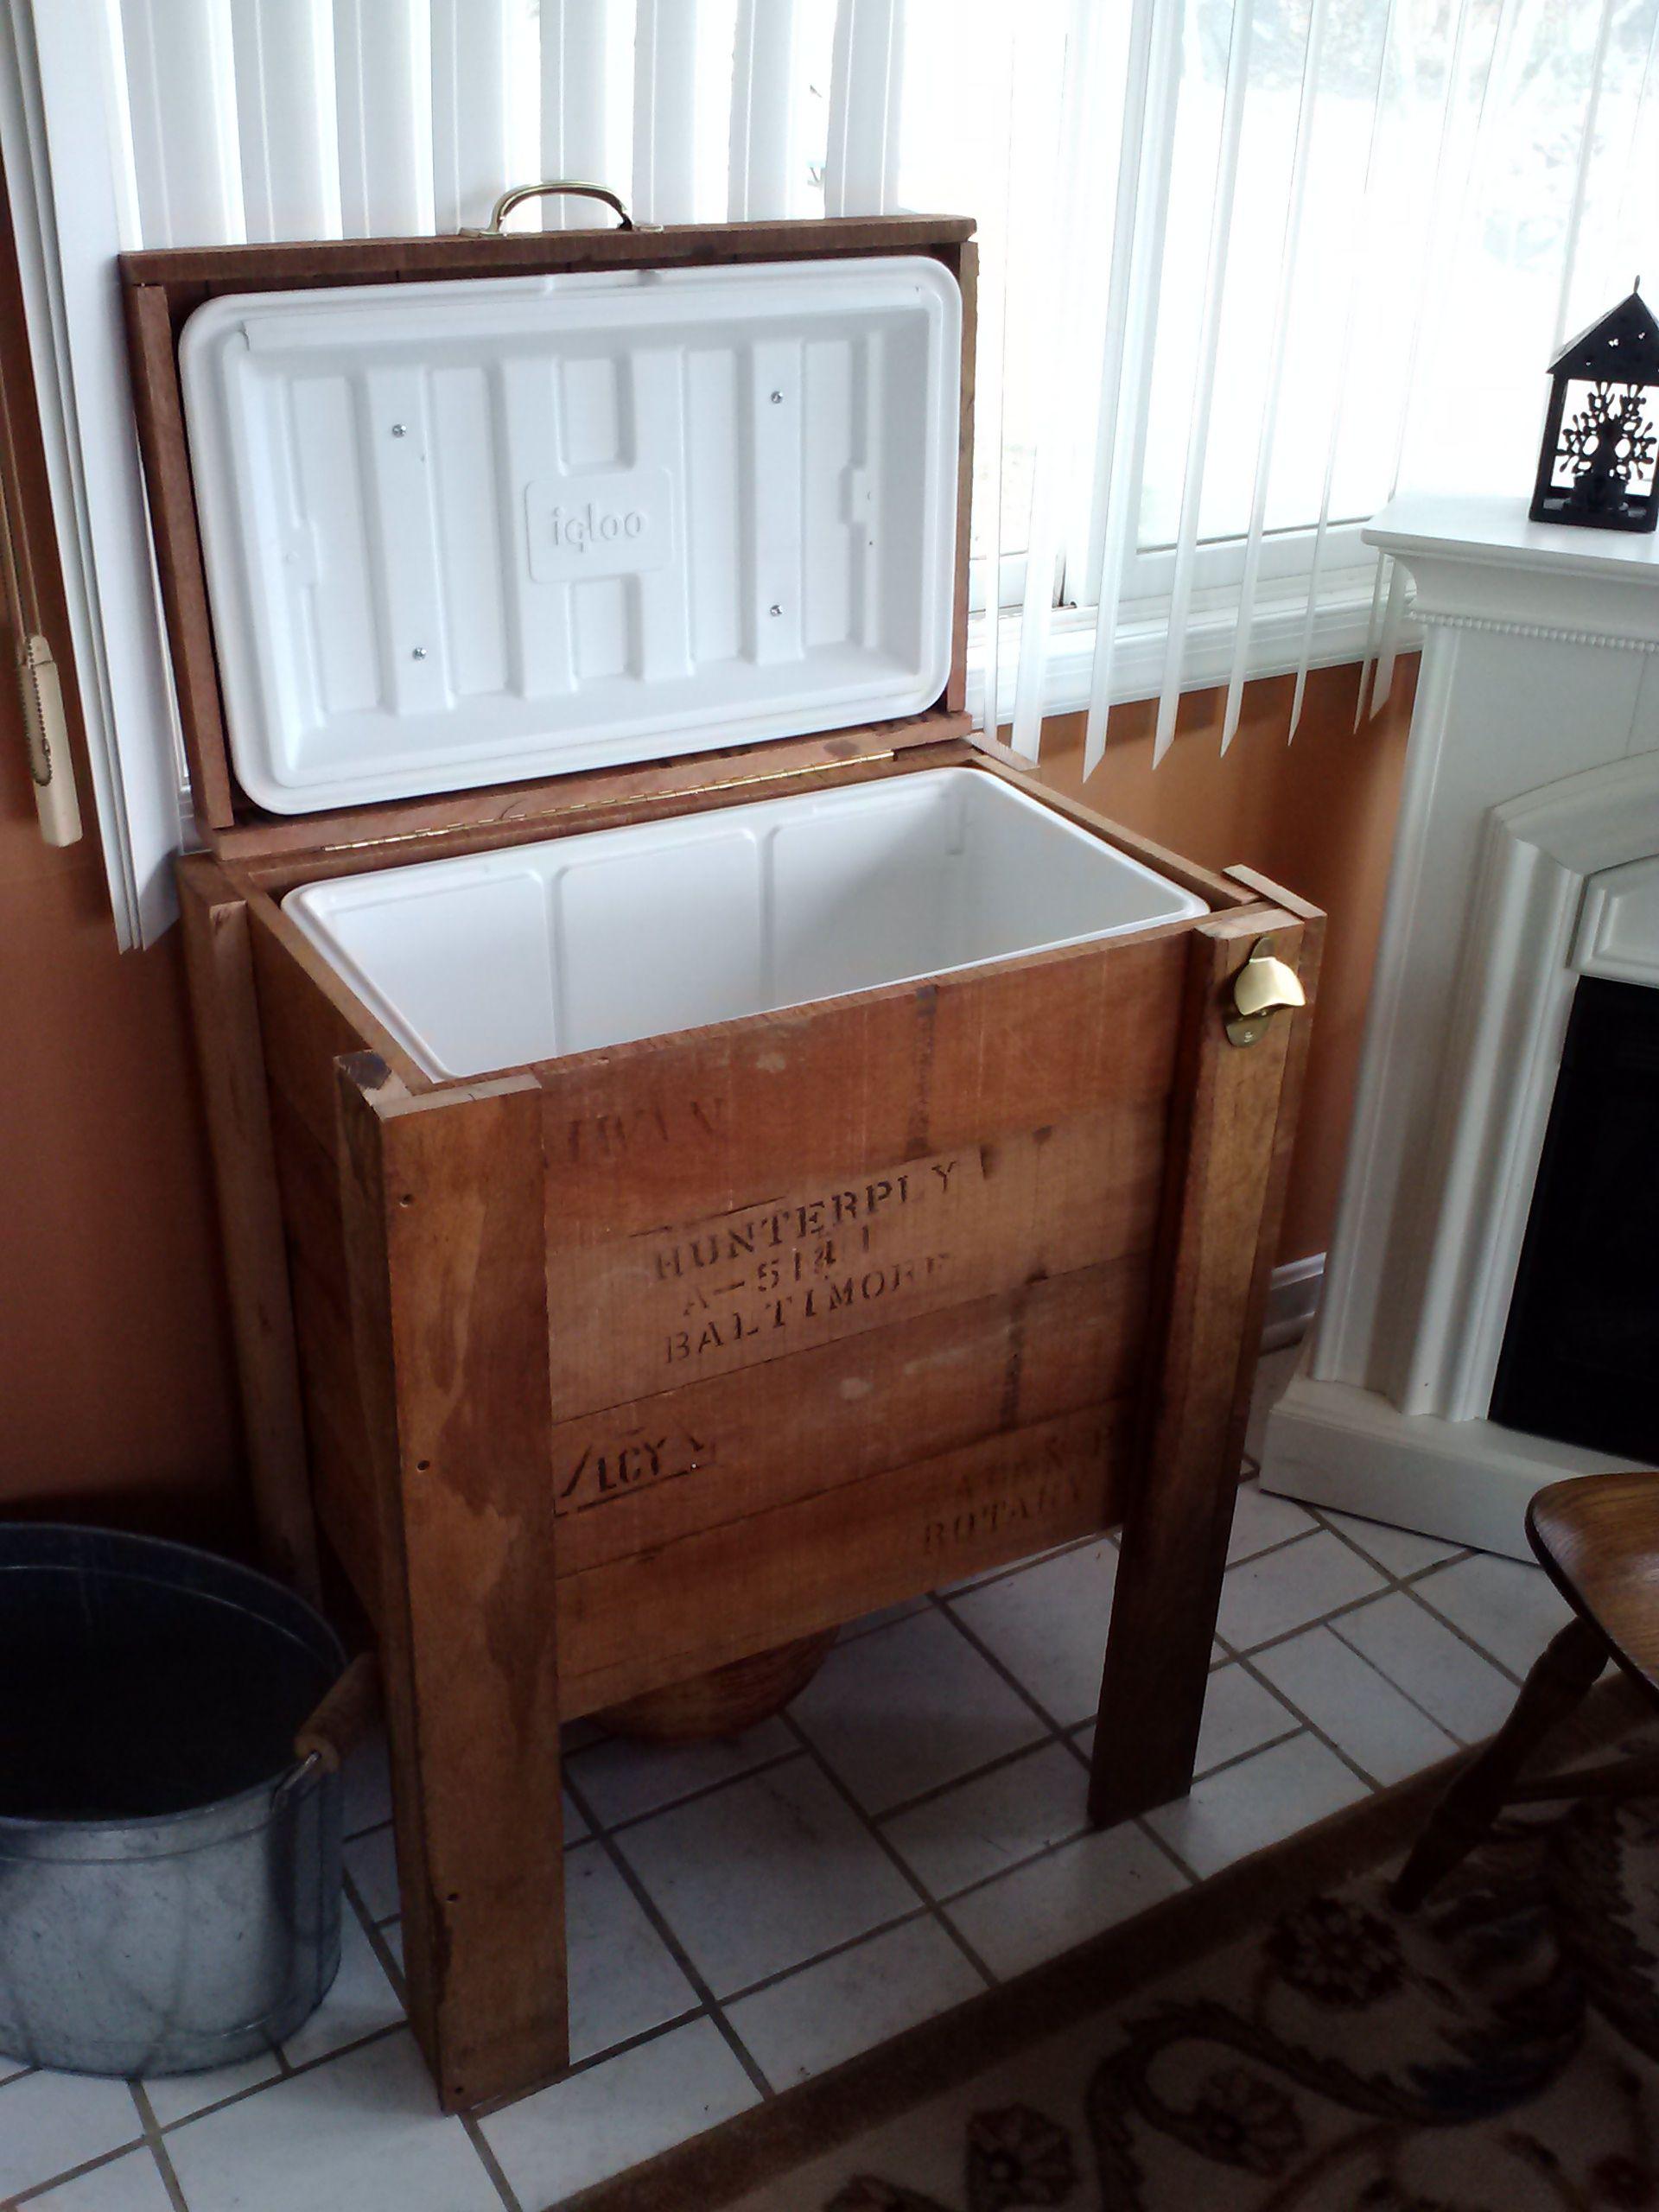 Patio Cooler Stand Project 2 Pallet Cooler Wooden Diy Diy Cooler